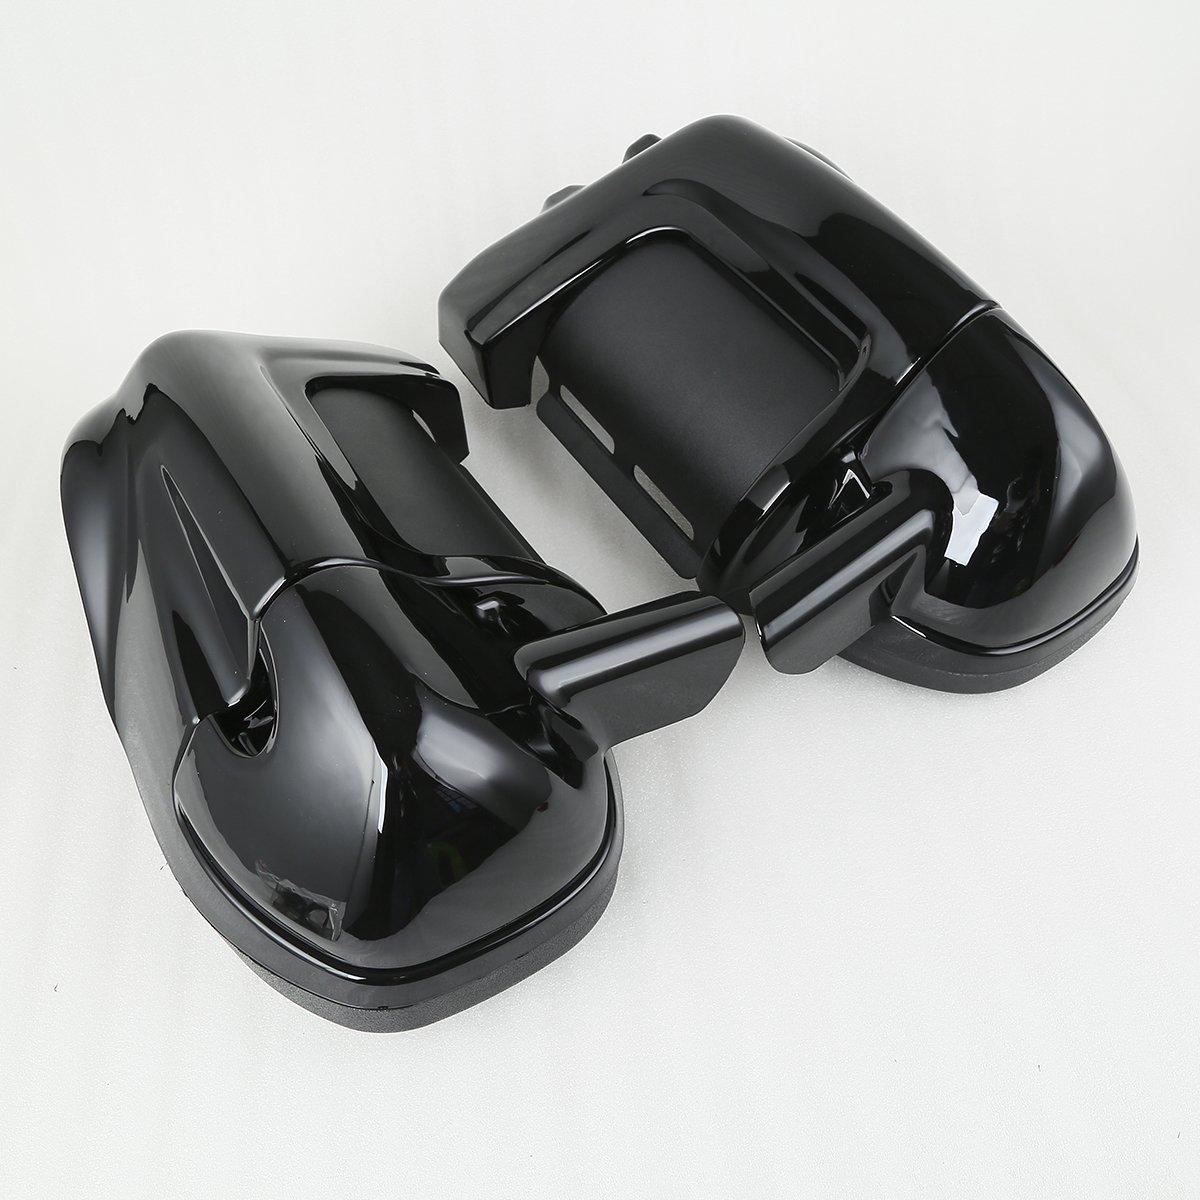 XMT-MOTO Black Lower Vented Leg Fairings Cap Glove Box For Harley-Davidson Touring Models 1983-2013 by XMT-MOTO (Image #9)